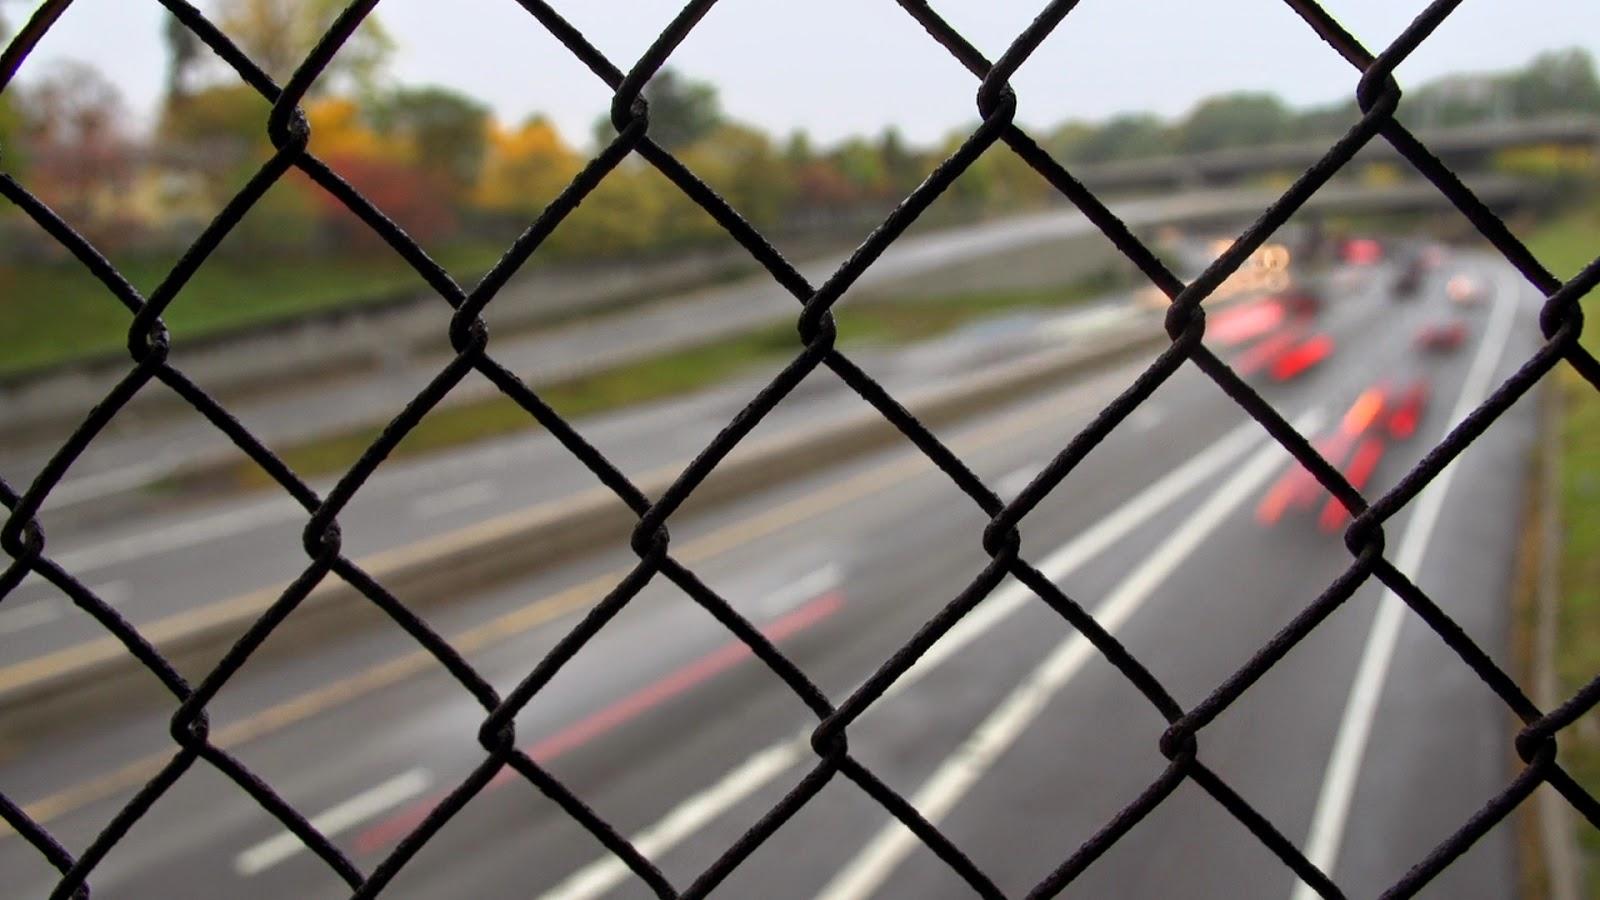 Fenced Highway